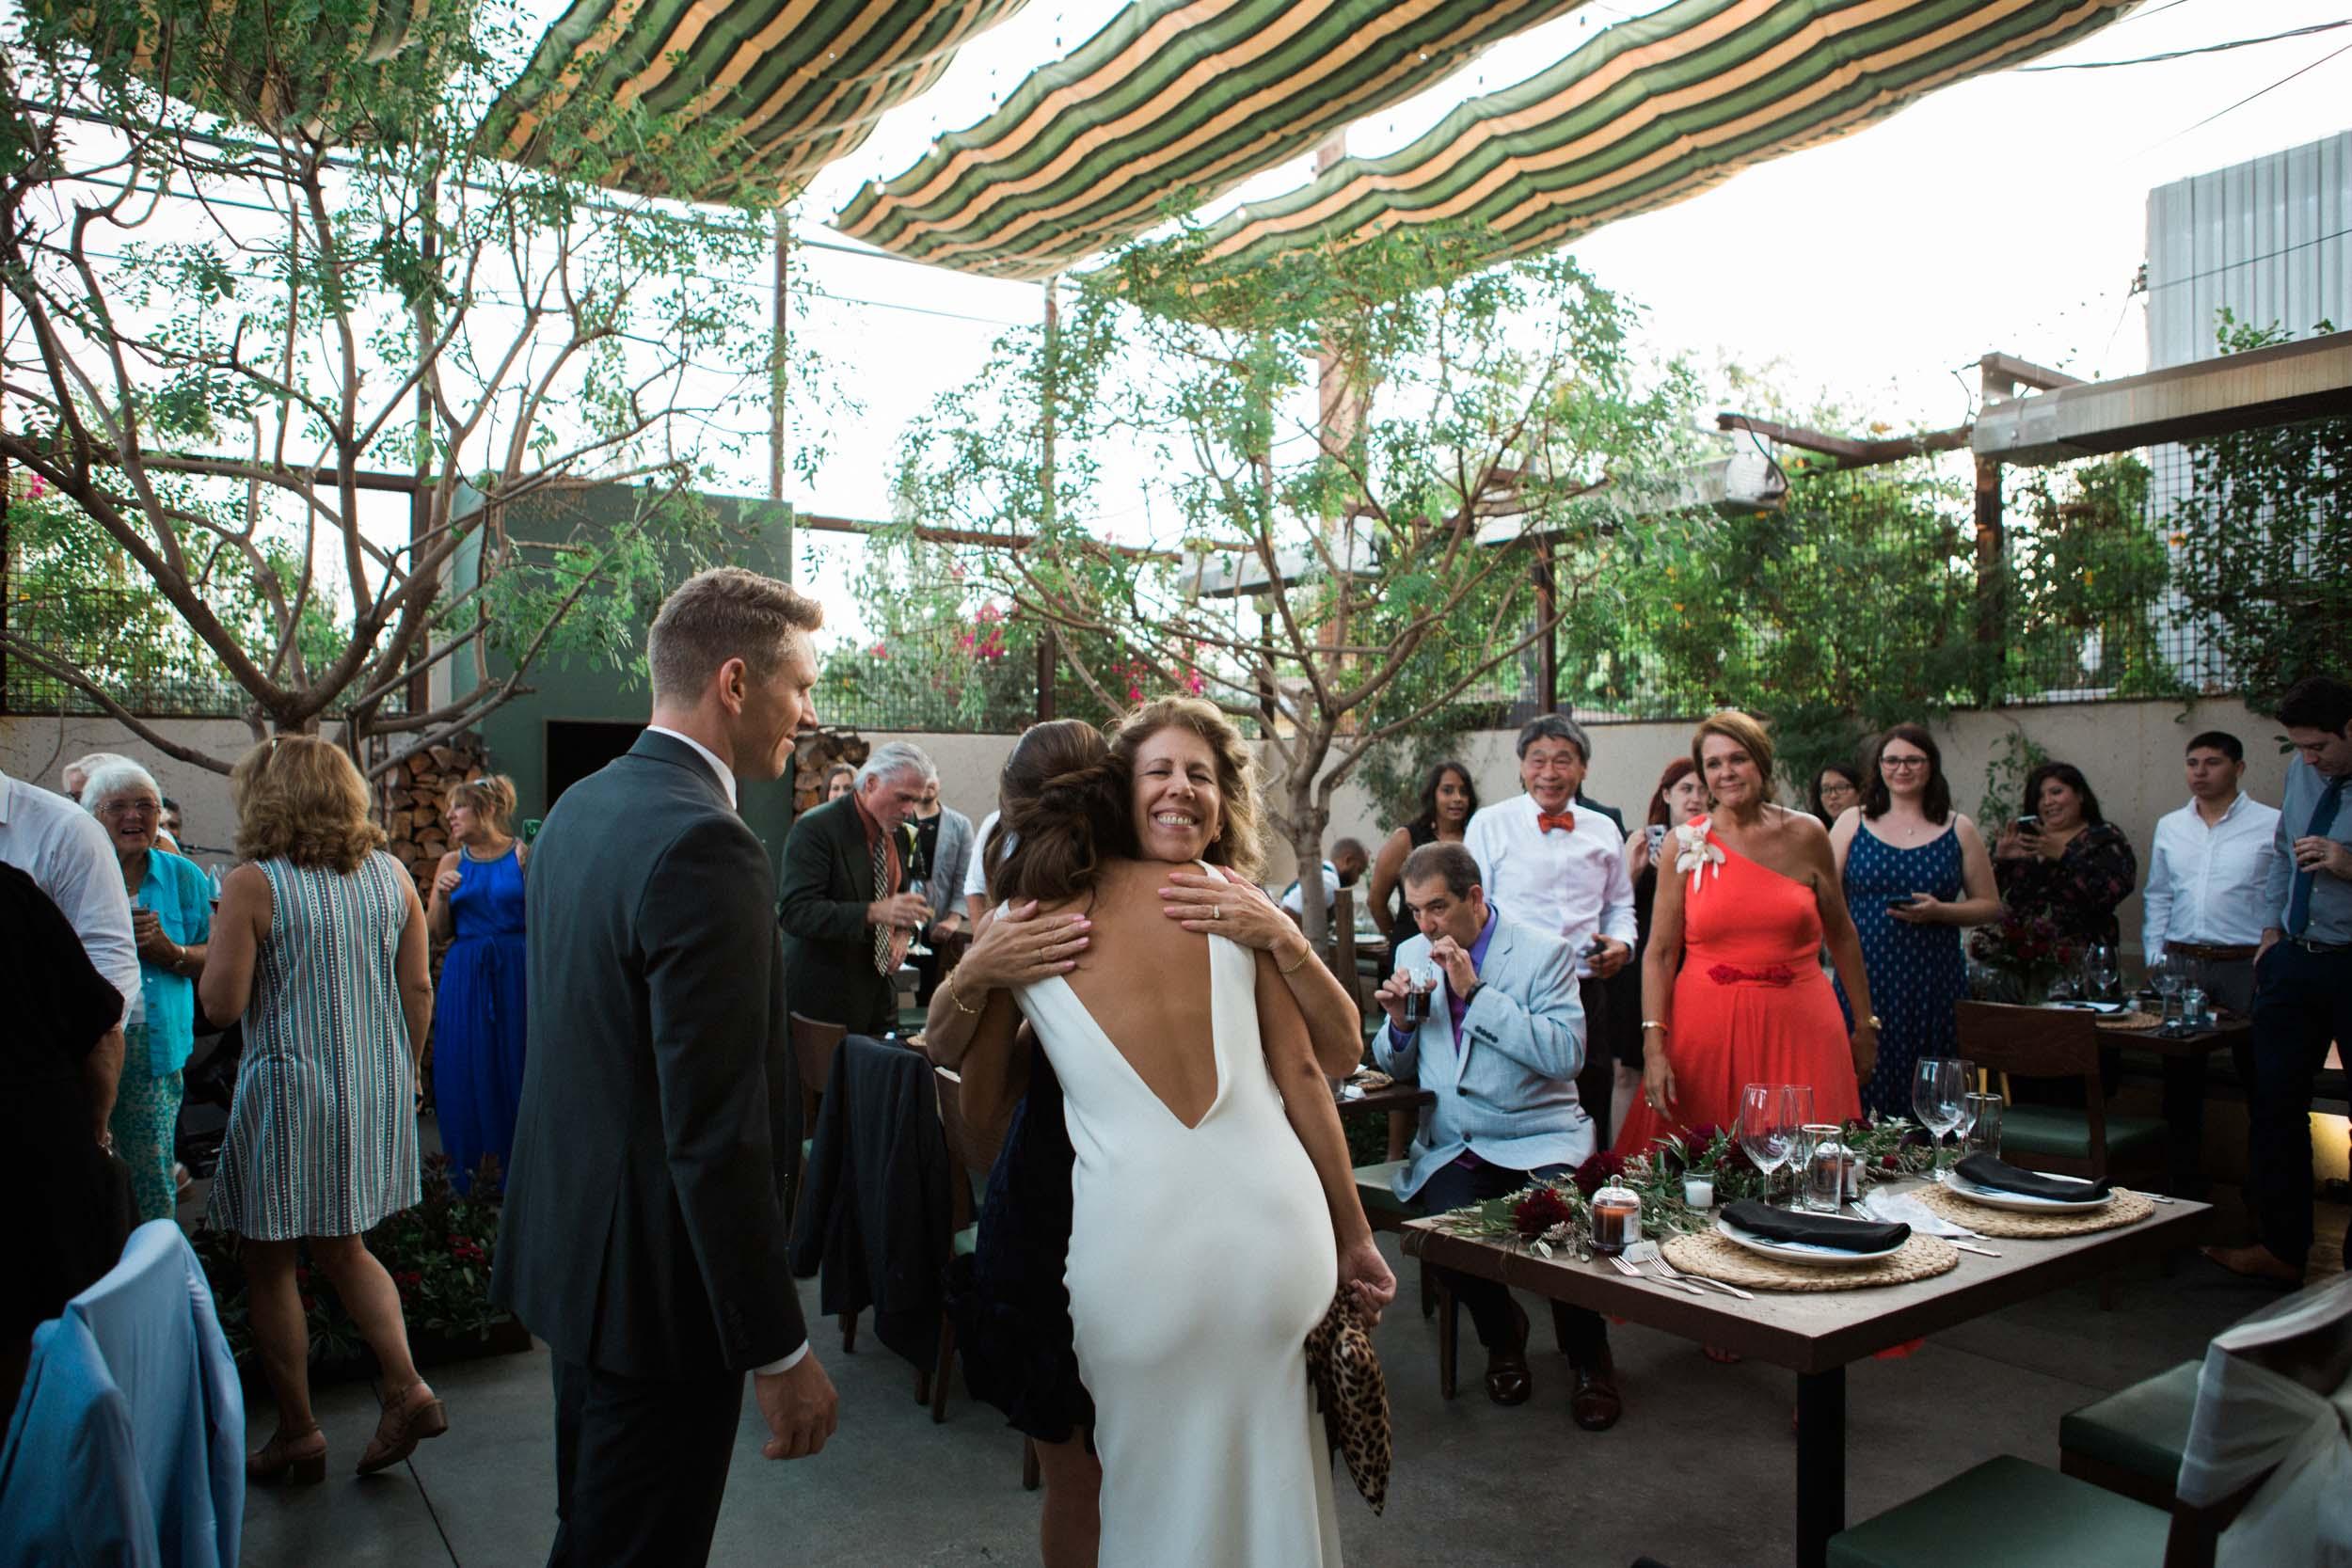 BKM-Photography-Highland-Park-Los-Angeles-Backyard-Wedding-0054.jpg